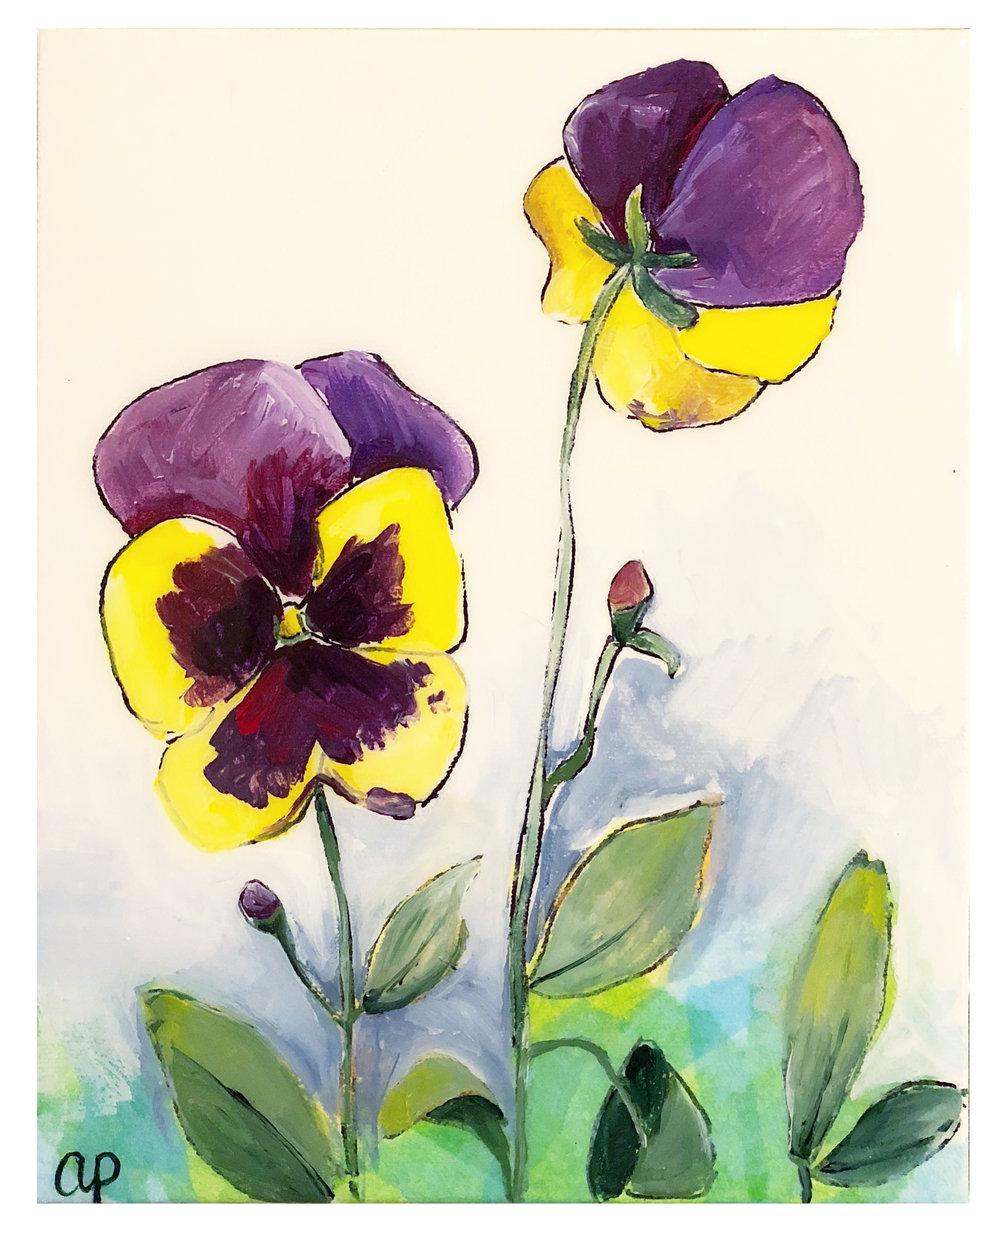 Flower View #8